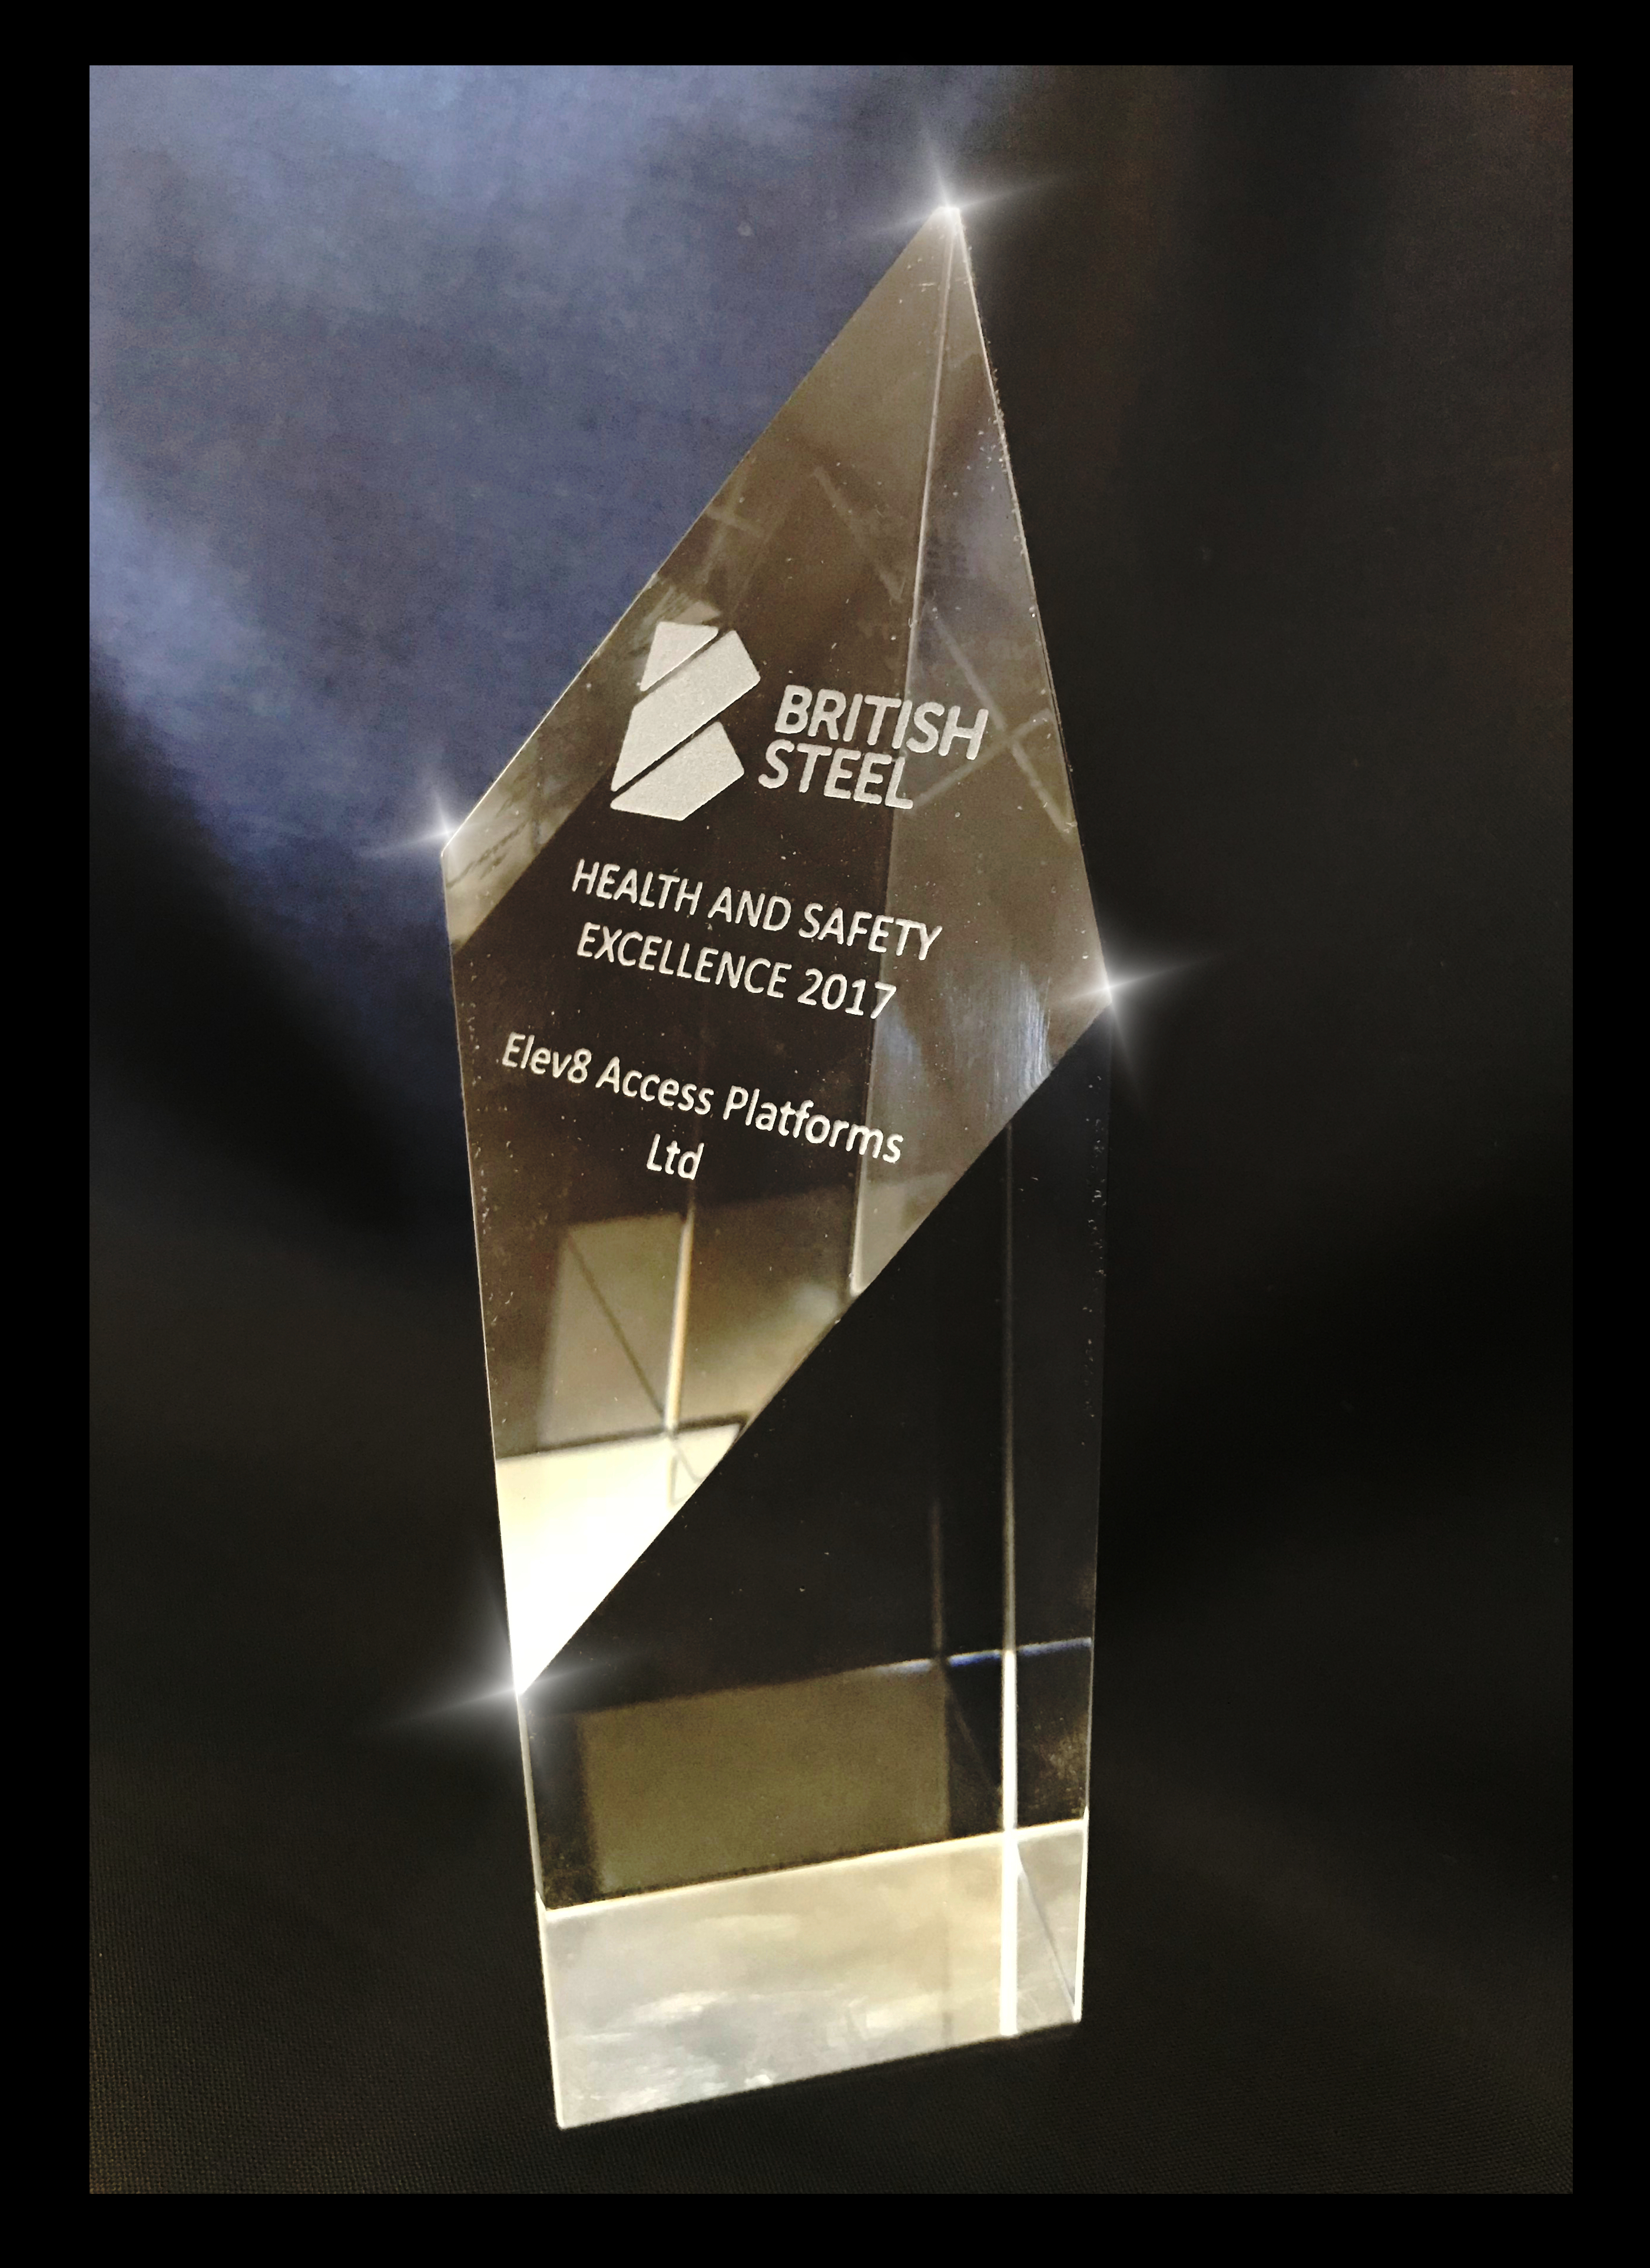 Safety award winning access platform company